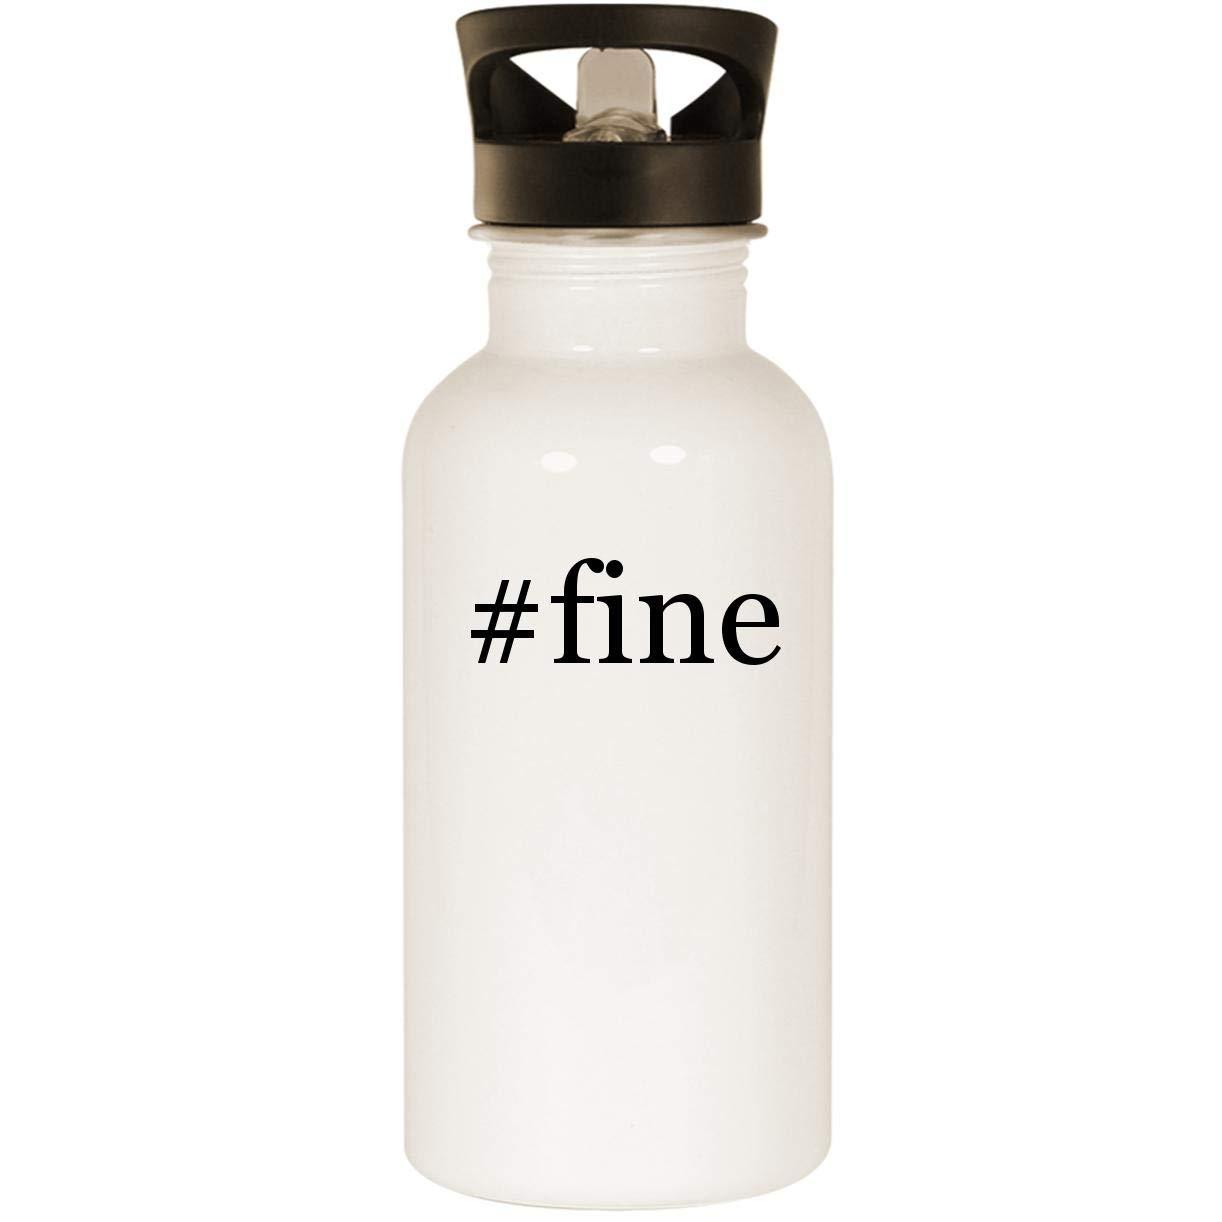 #fine - Stainless Steel 20oz Road Ready Water Bottle, White